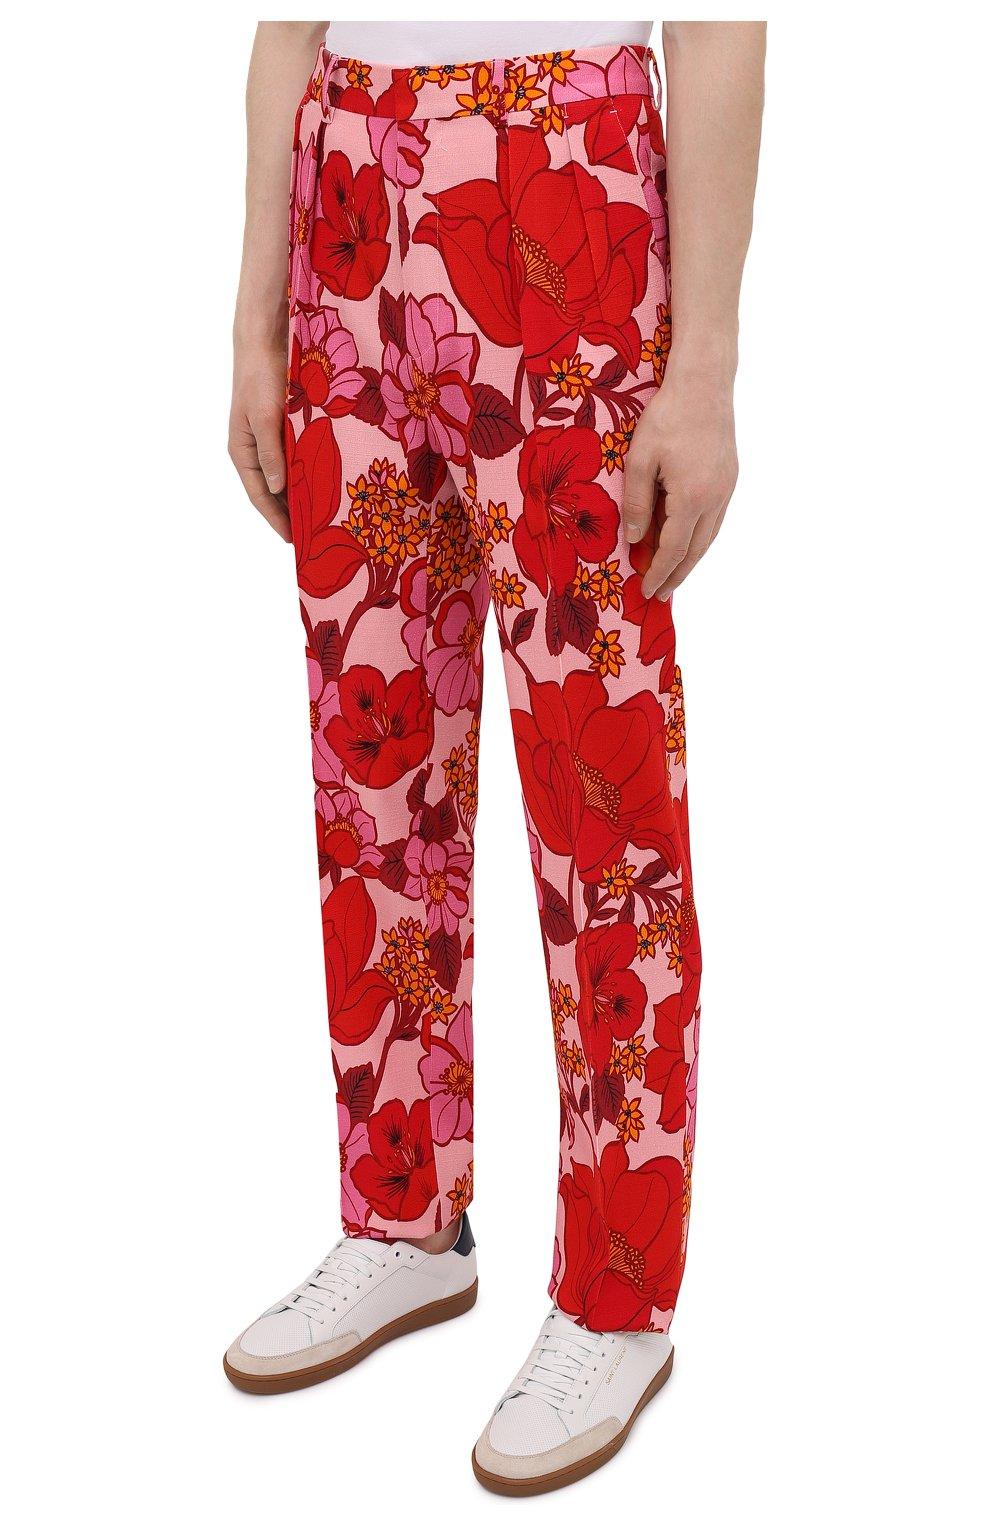 Мужские брюки из вискозы TOM FORD красного цвета, арт. 942R55/759F42 | Фото 3